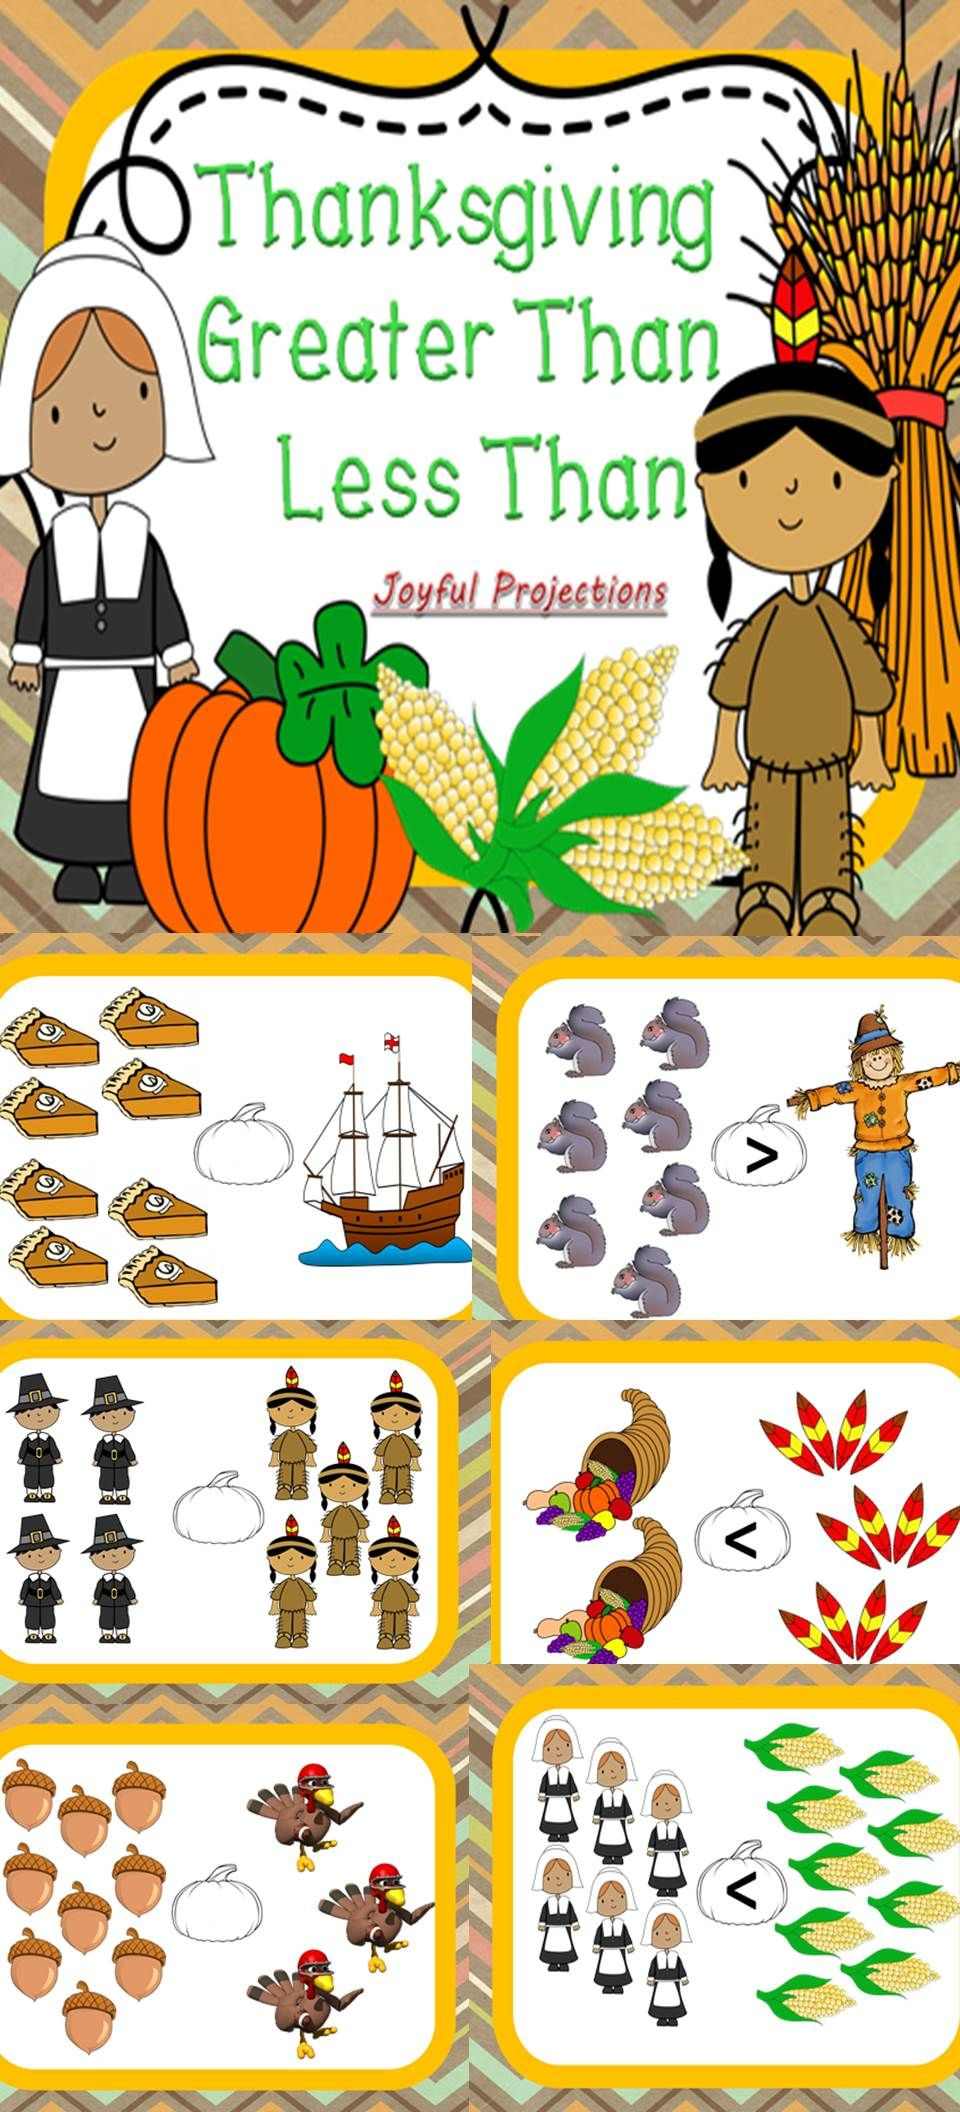 Thanksgiving math greater than less than smartboard fun thanksgiving math greater than less than smartboard fun buycottarizona Choice Image